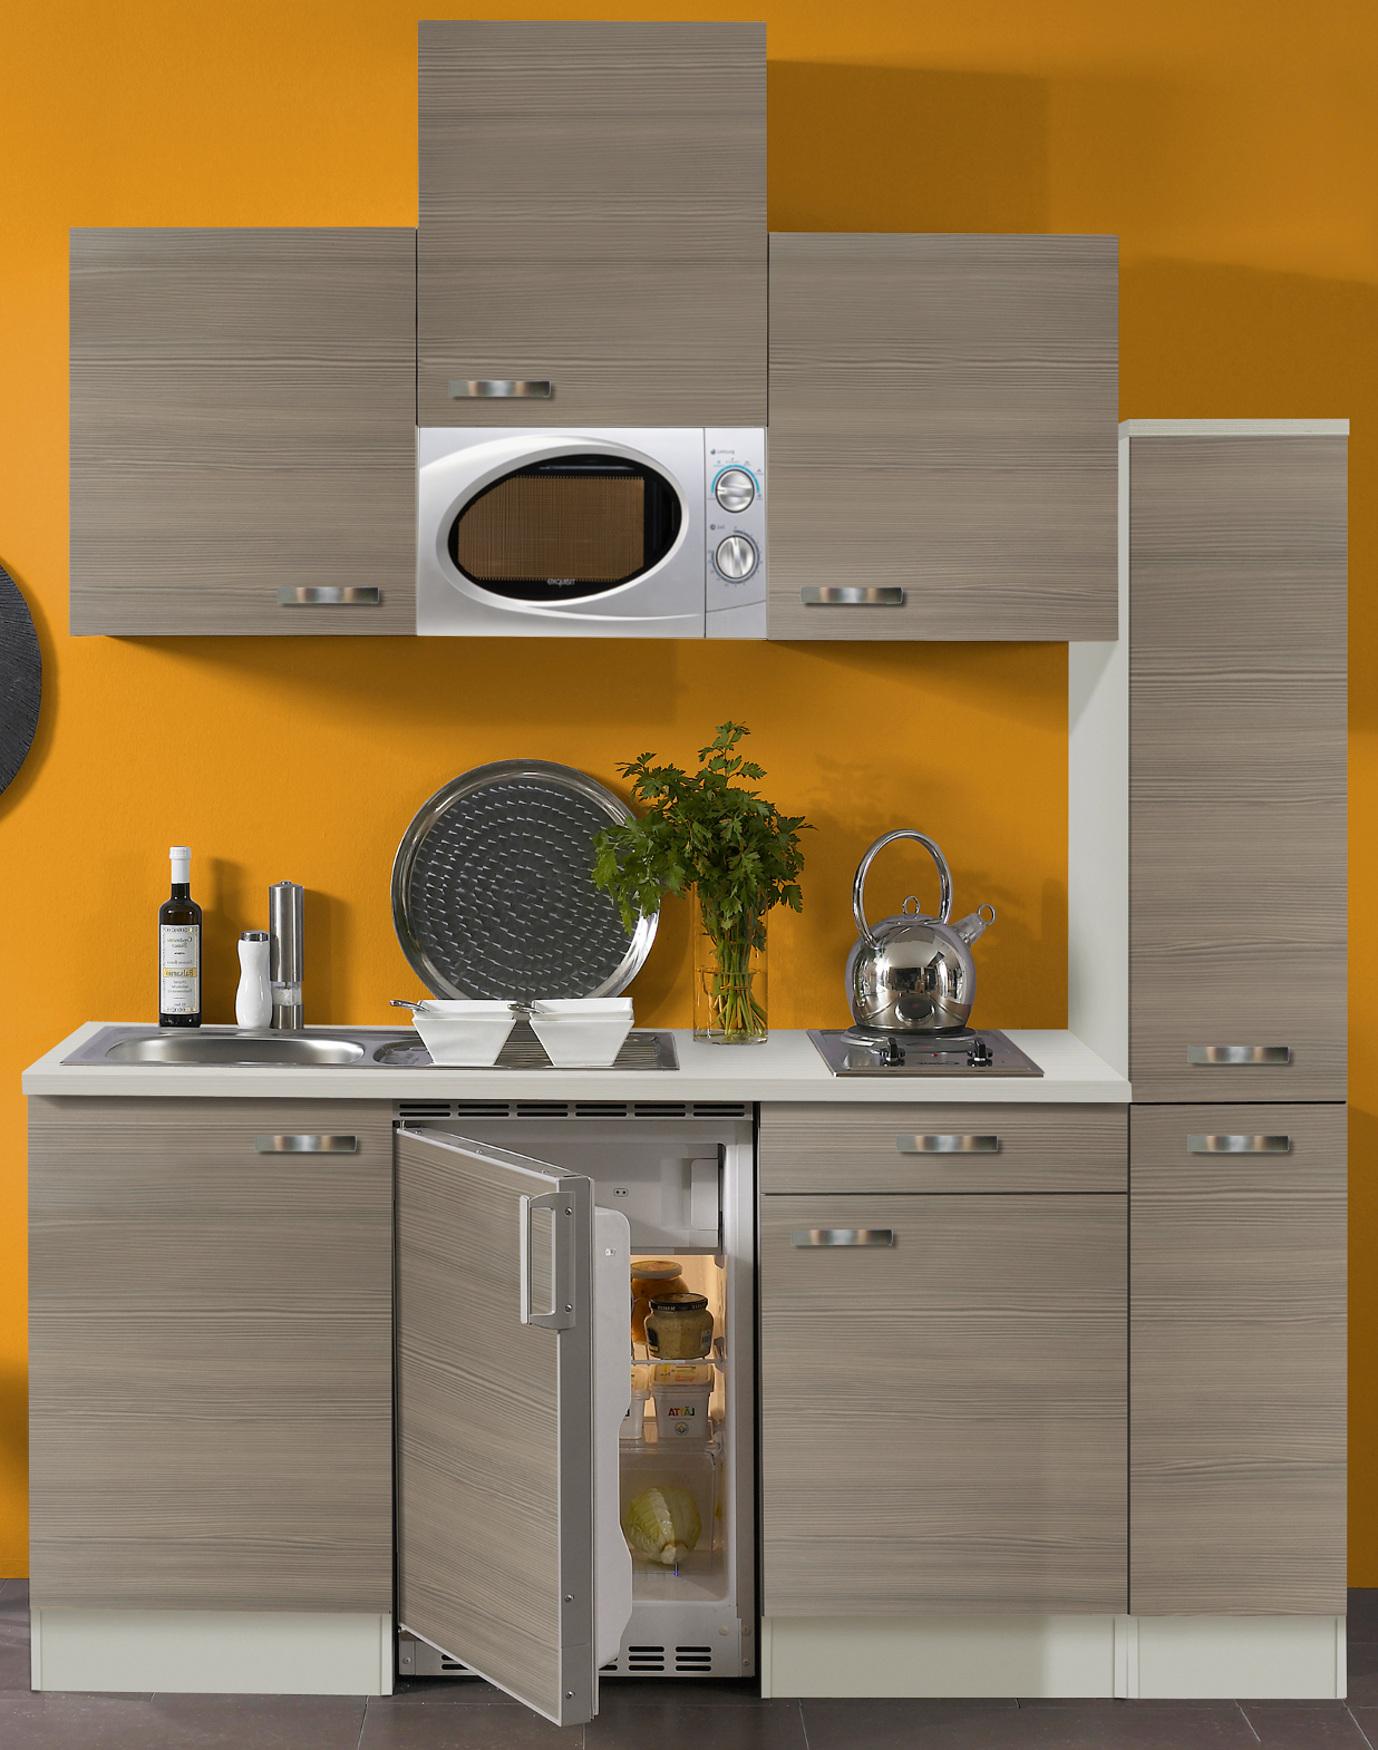 singlek che toledo vario 1 mit mikrowelle breite 180 cm pinie nougat k che singlek chen. Black Bedroom Furniture Sets. Home Design Ideas